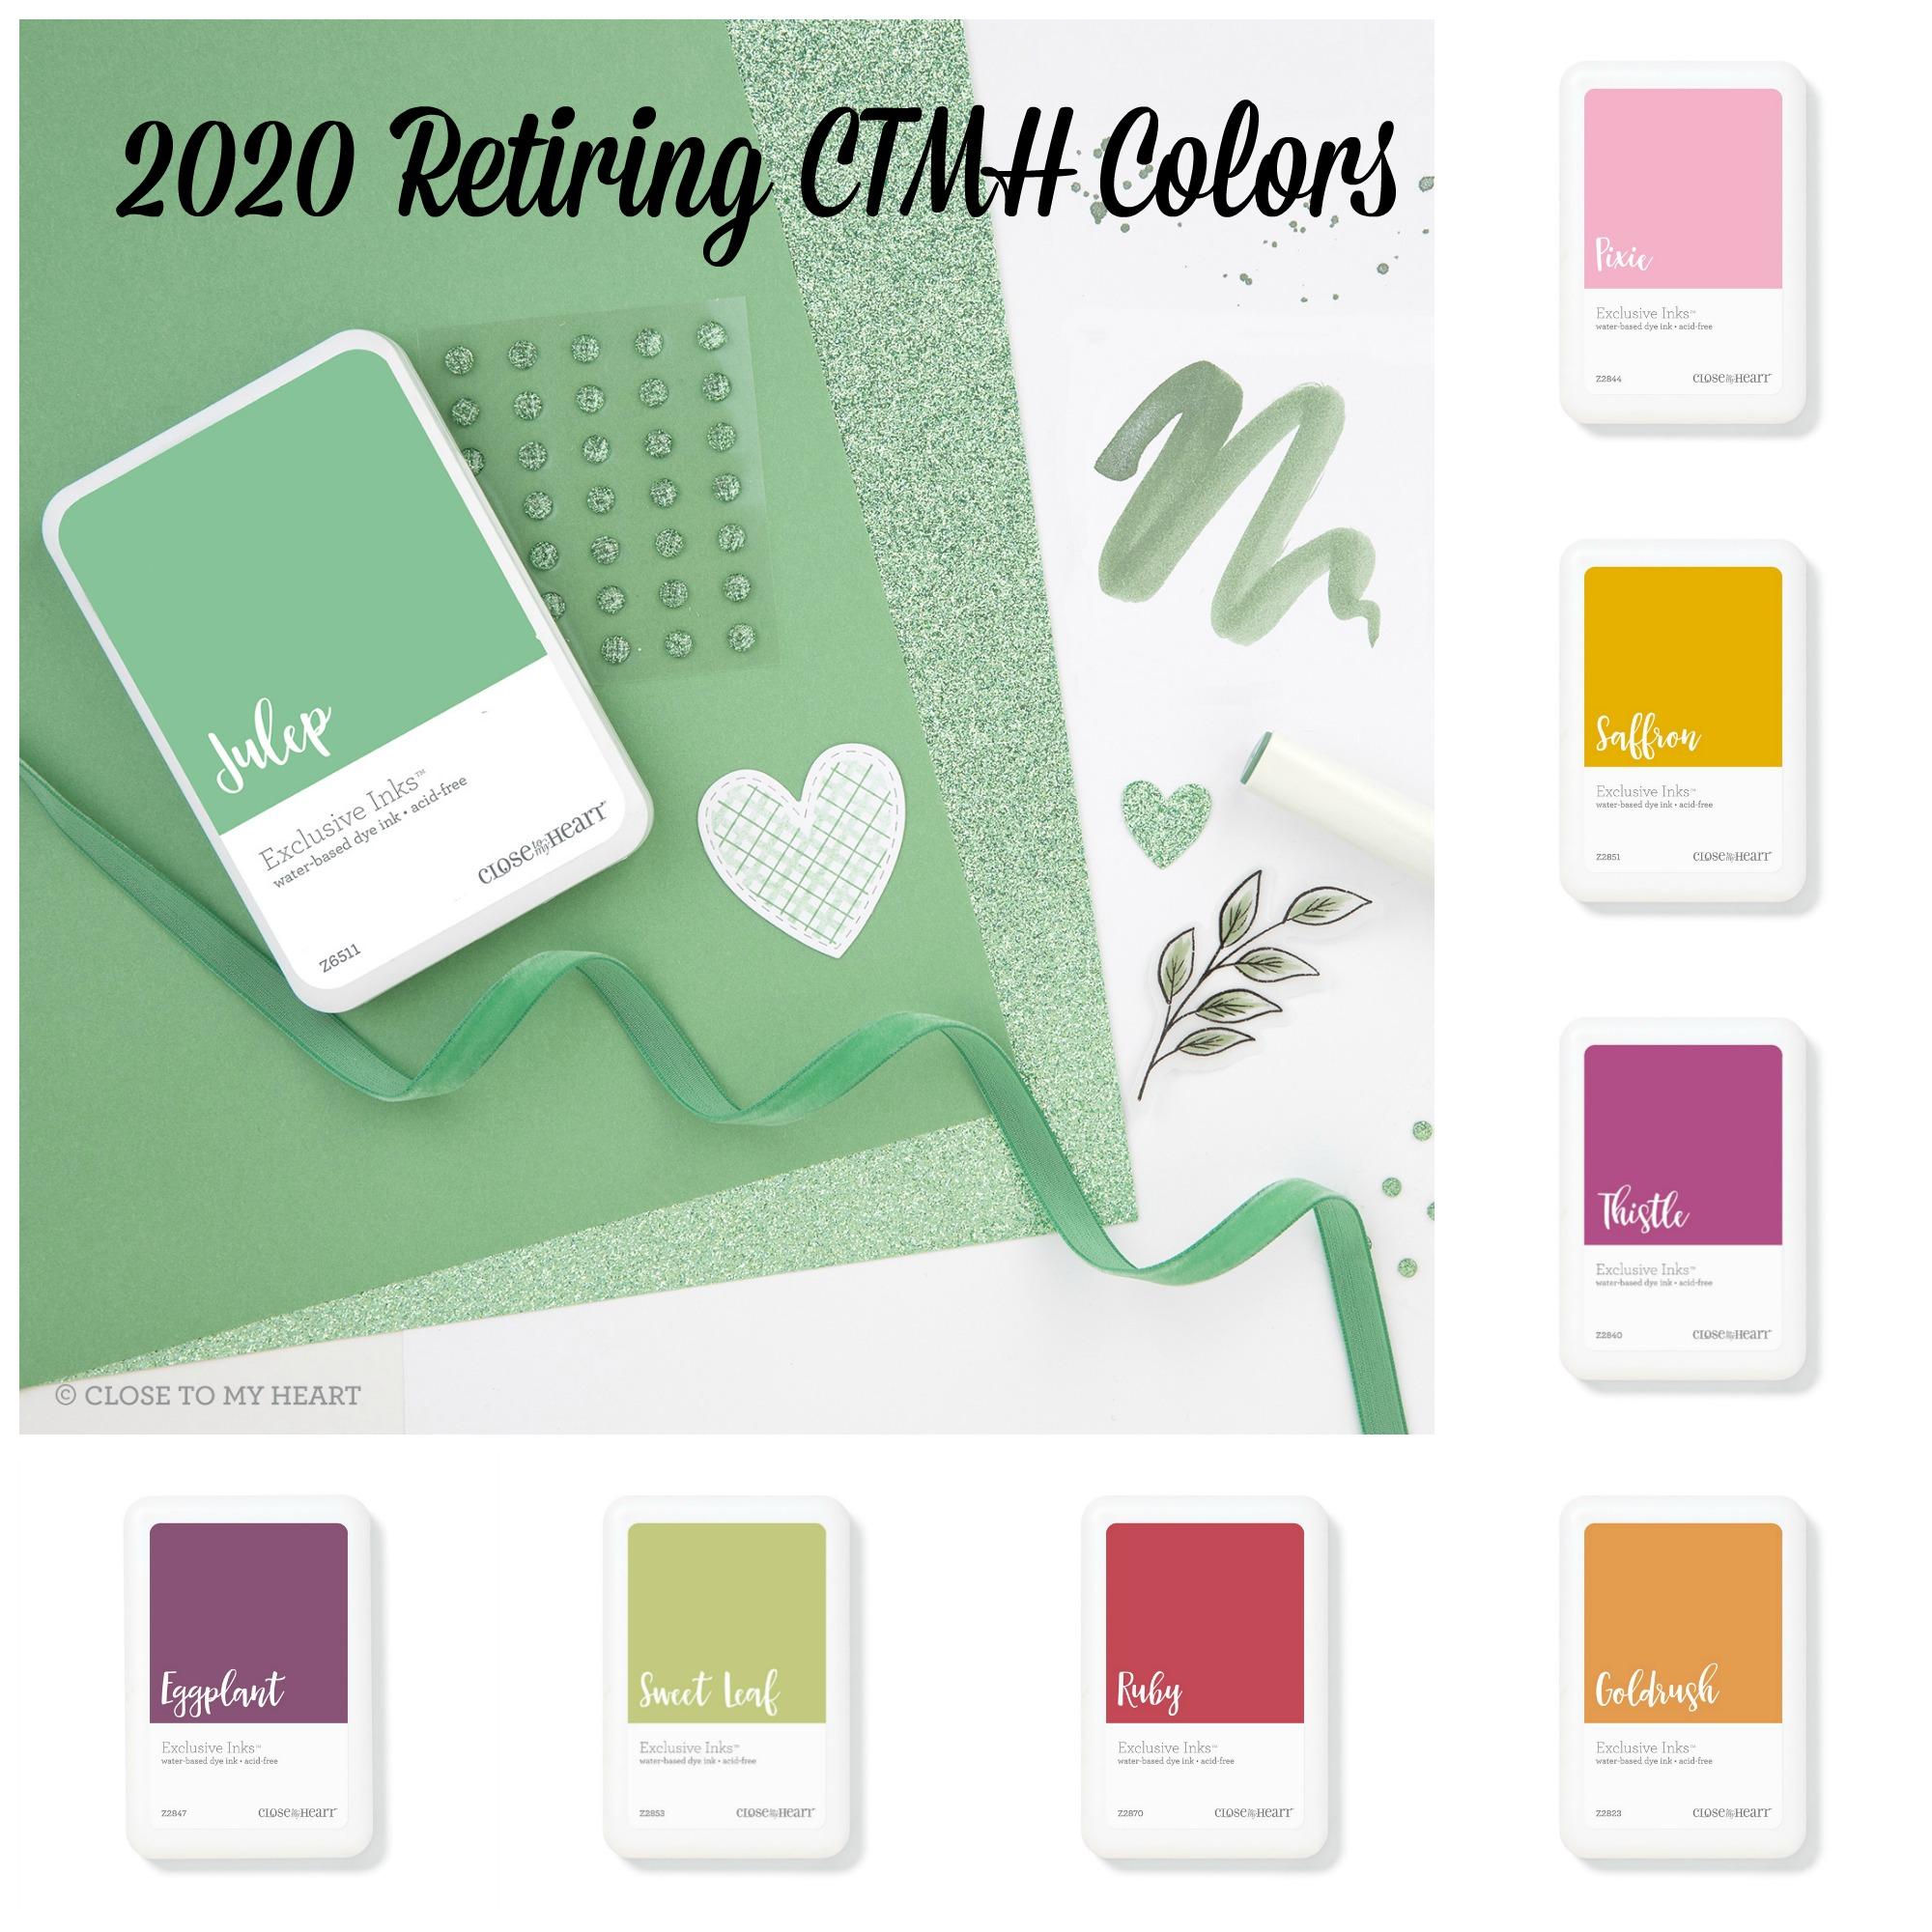 2020 Retiring CTMH Colors